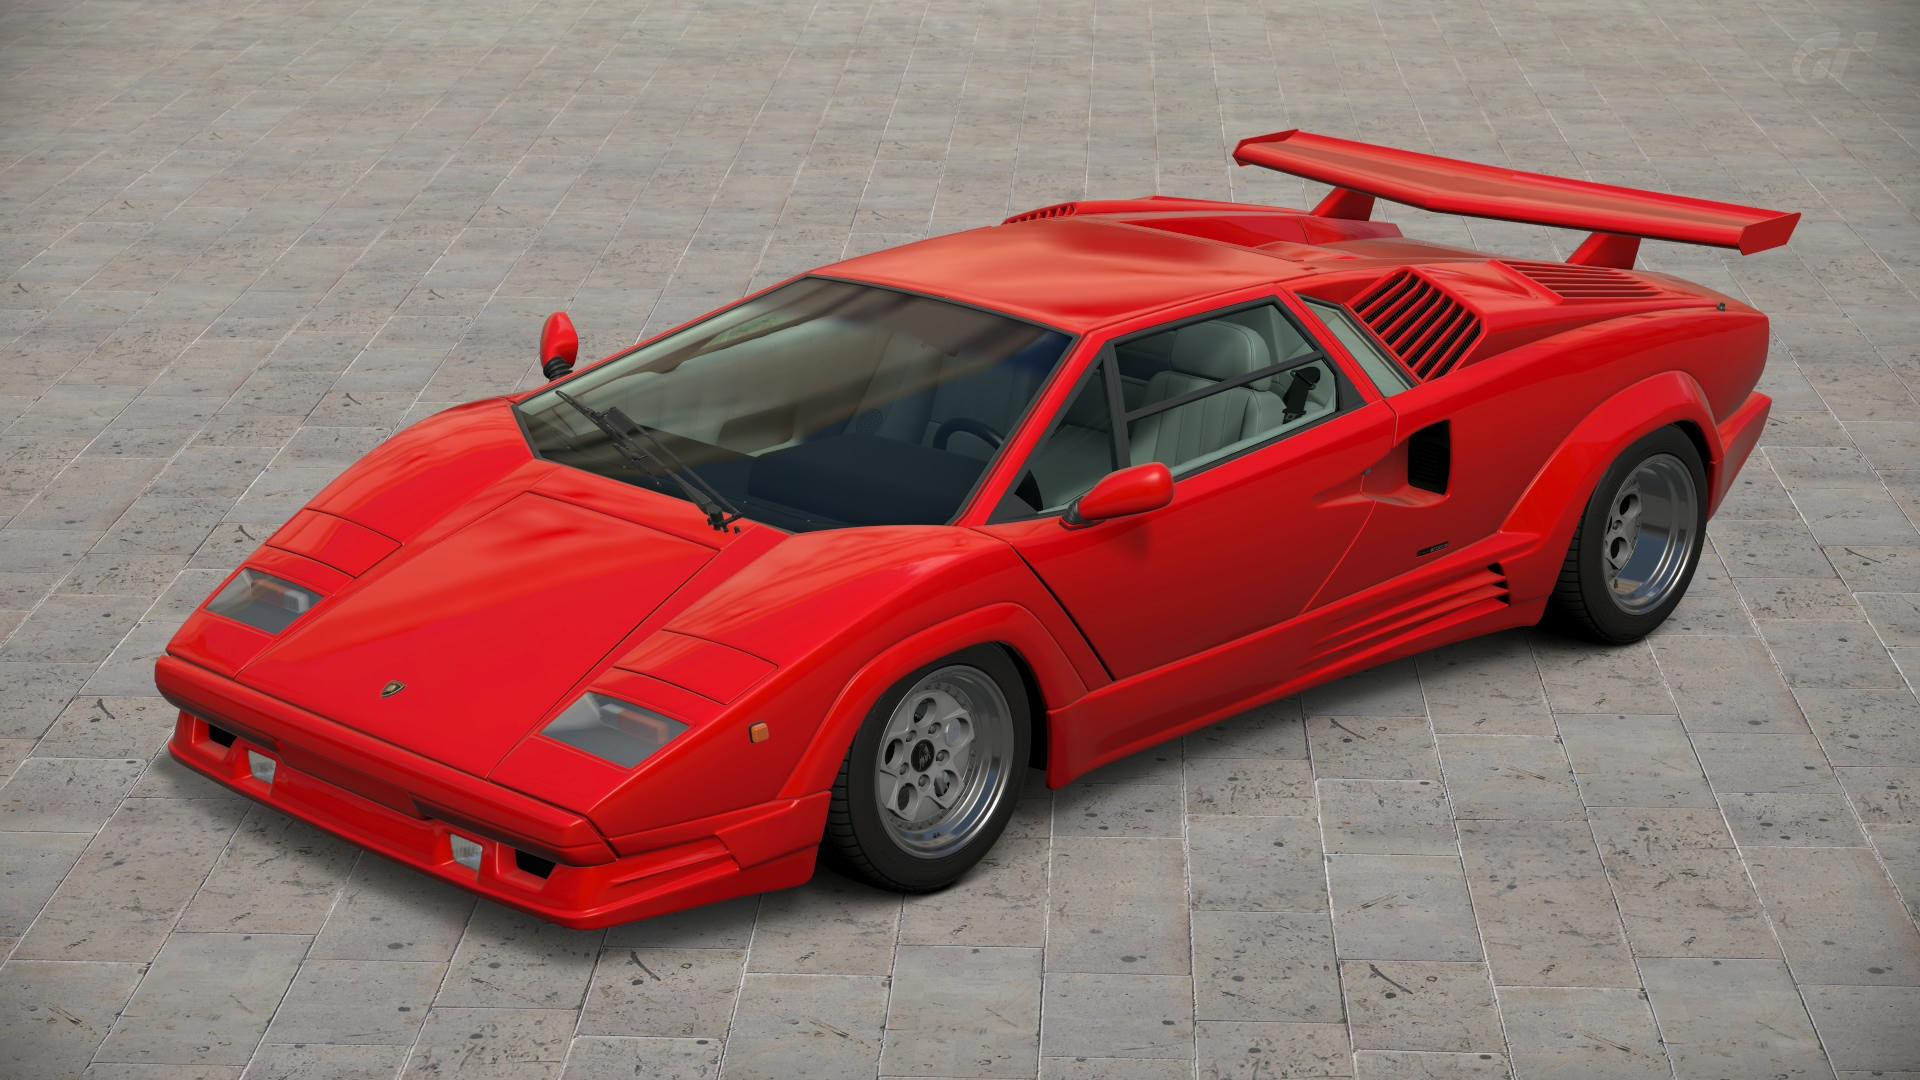 lamborghini_countach_25th_anniversary__gt6__by_vertualissimo-d774o3x Elegant Lamborghini Countach 25th Anniversary Specs Cars Trend